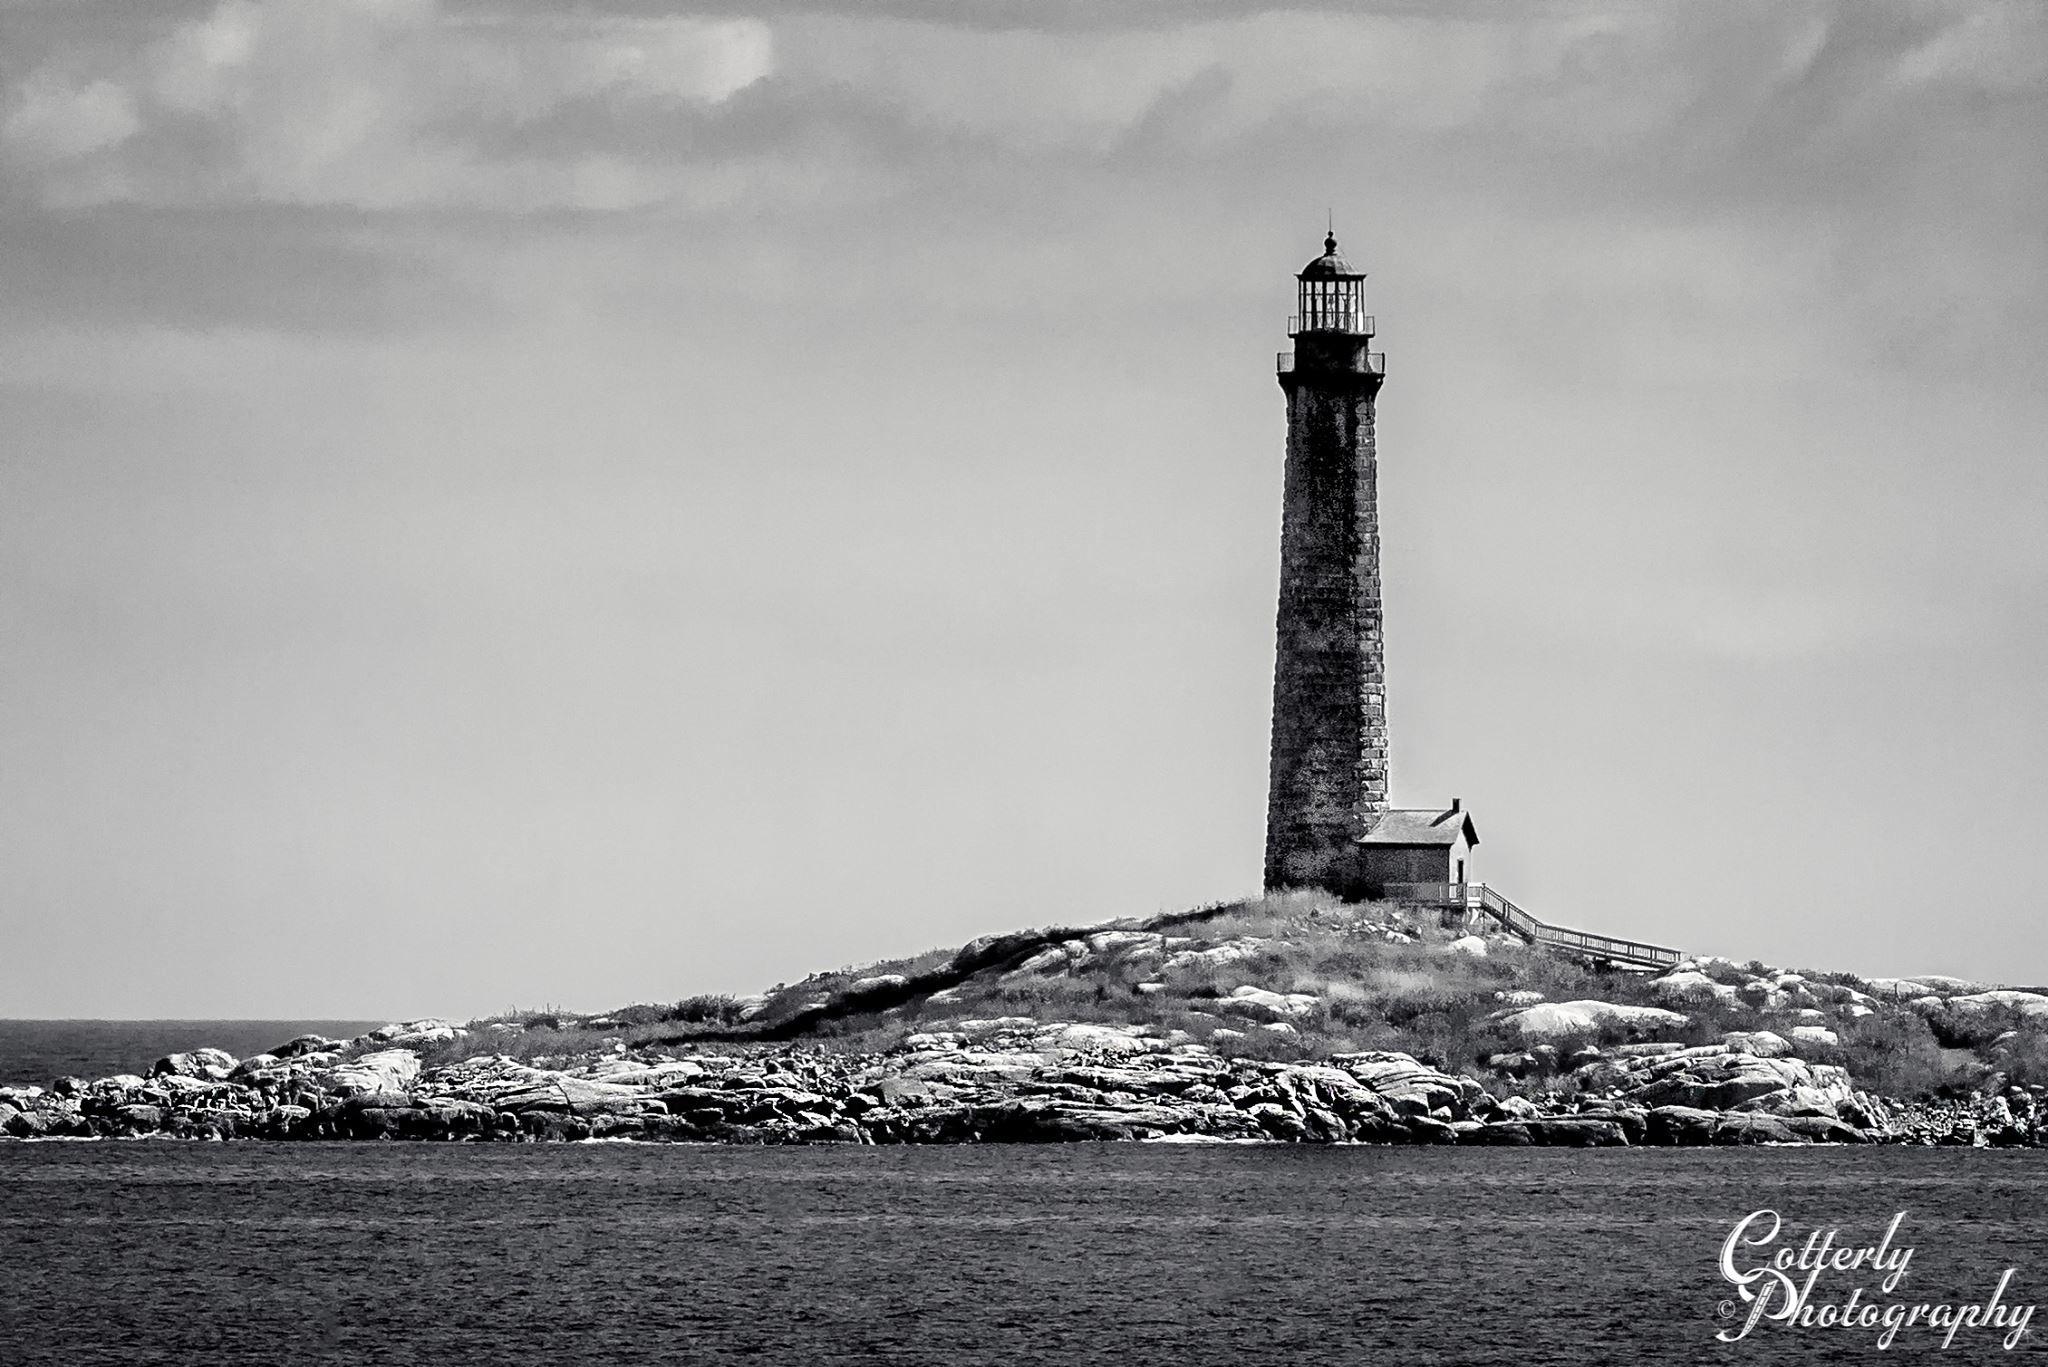 Thatcher Island North Light near Rockport, Massachusetts by Wayne Cotterly photography